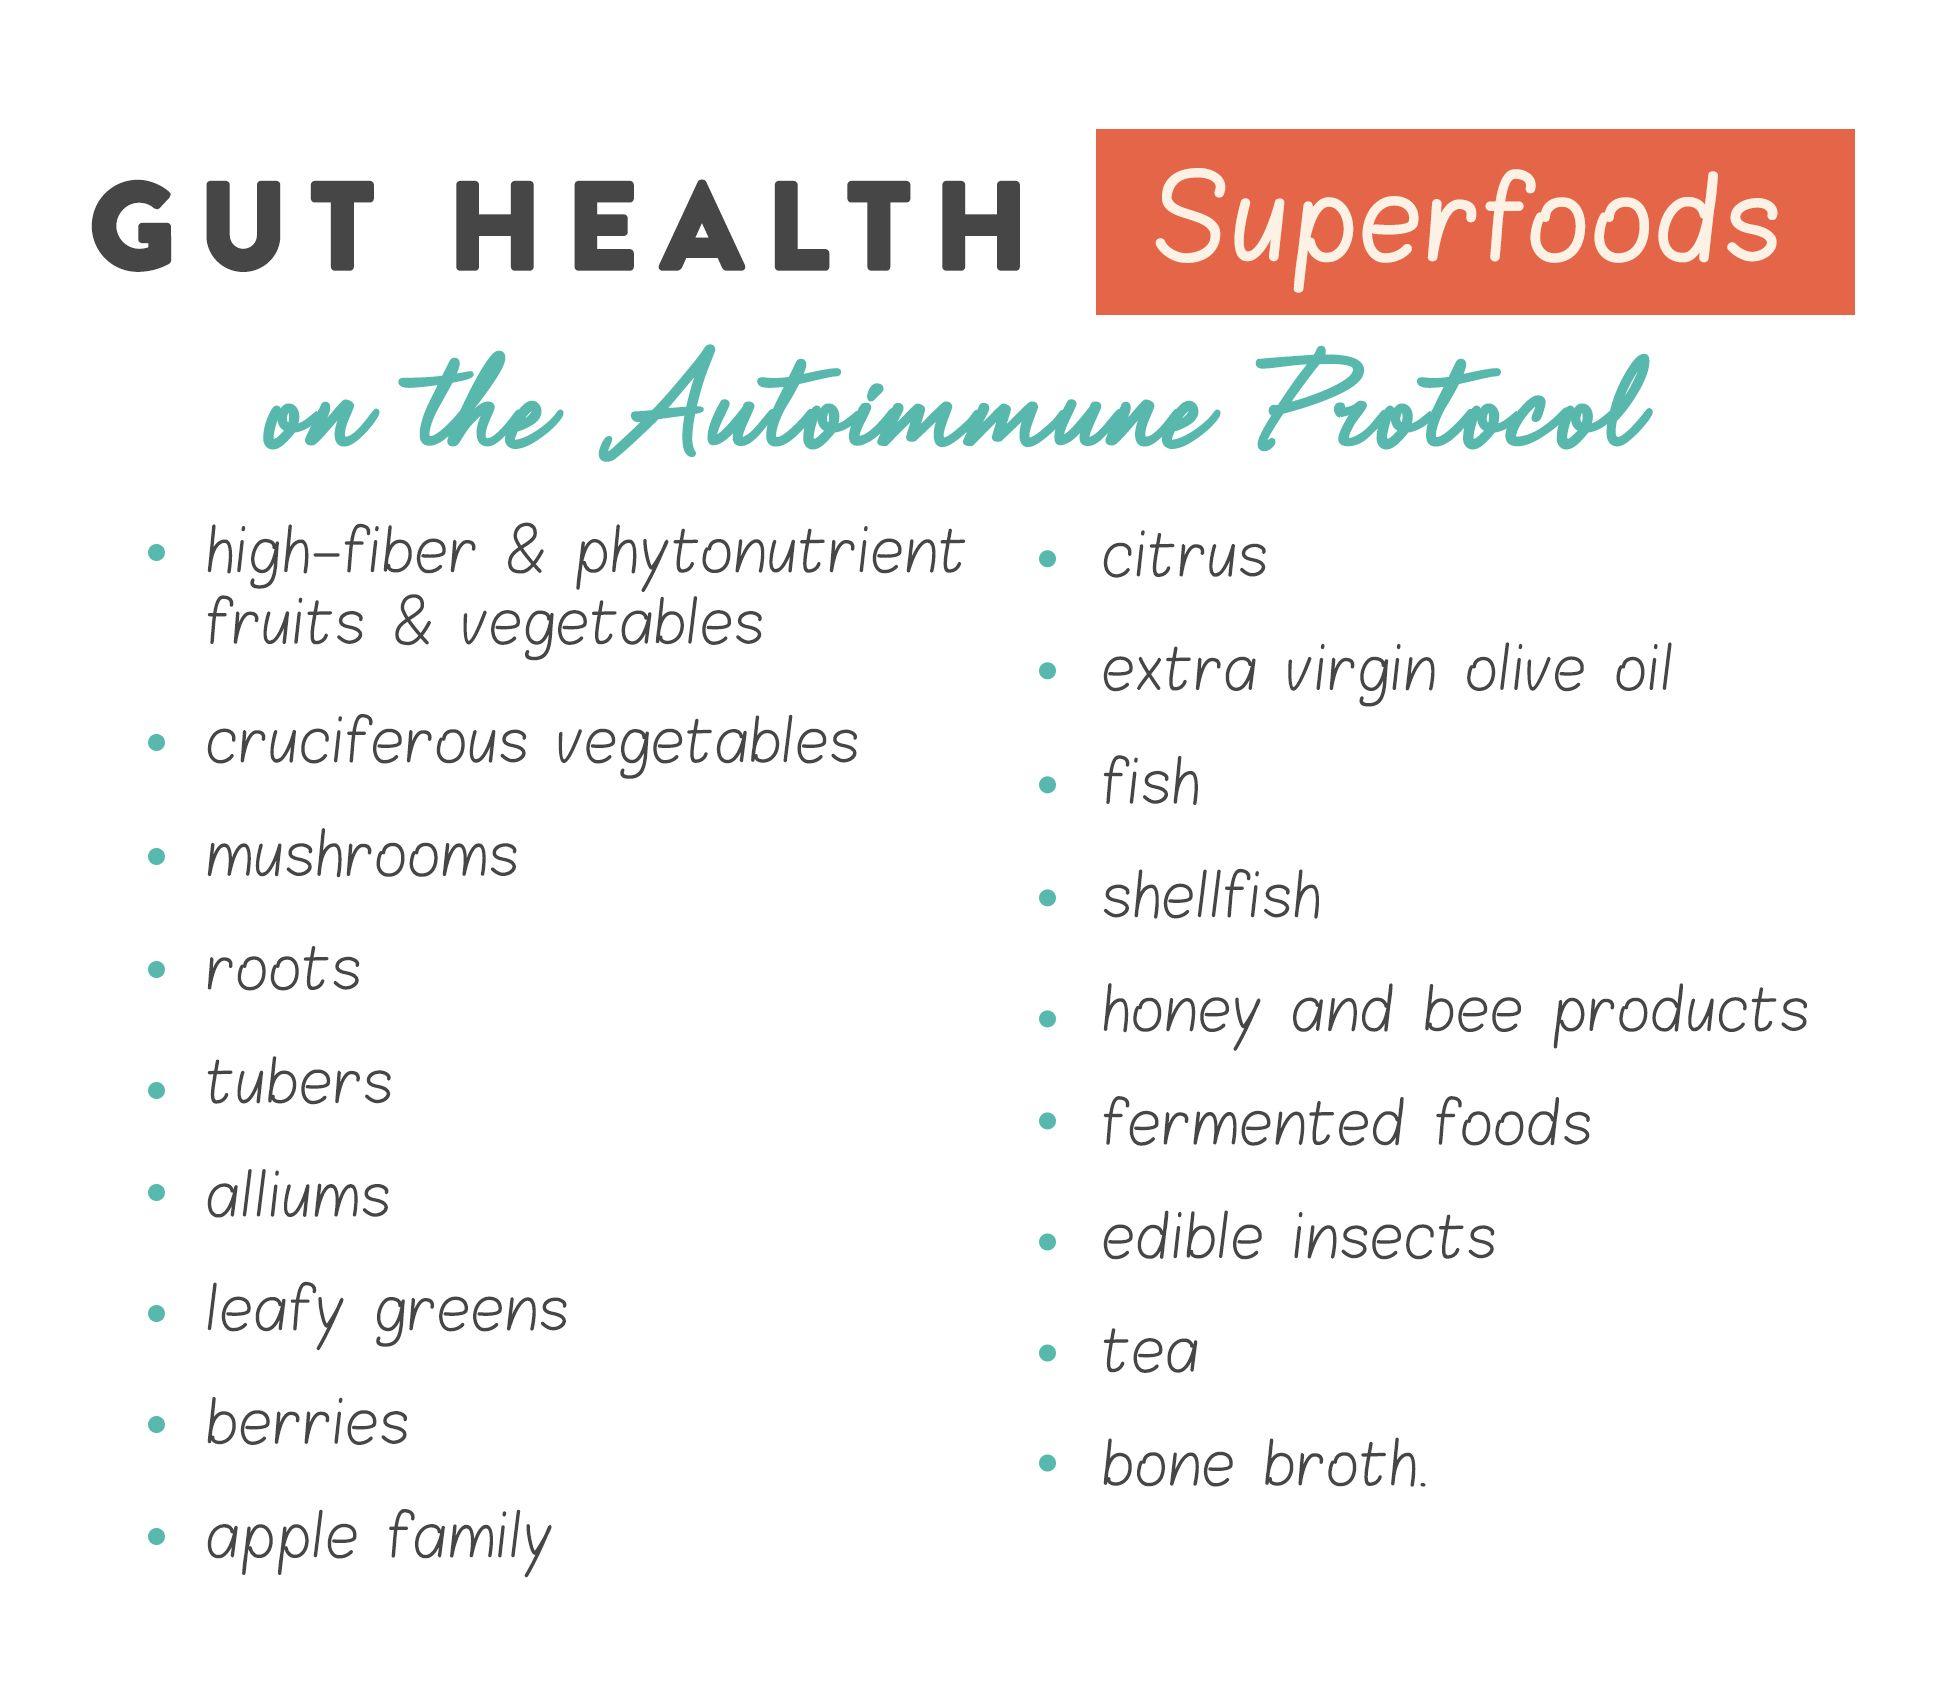 Updates to the Autoimmune Protocol Paleo mom, Paleo diet